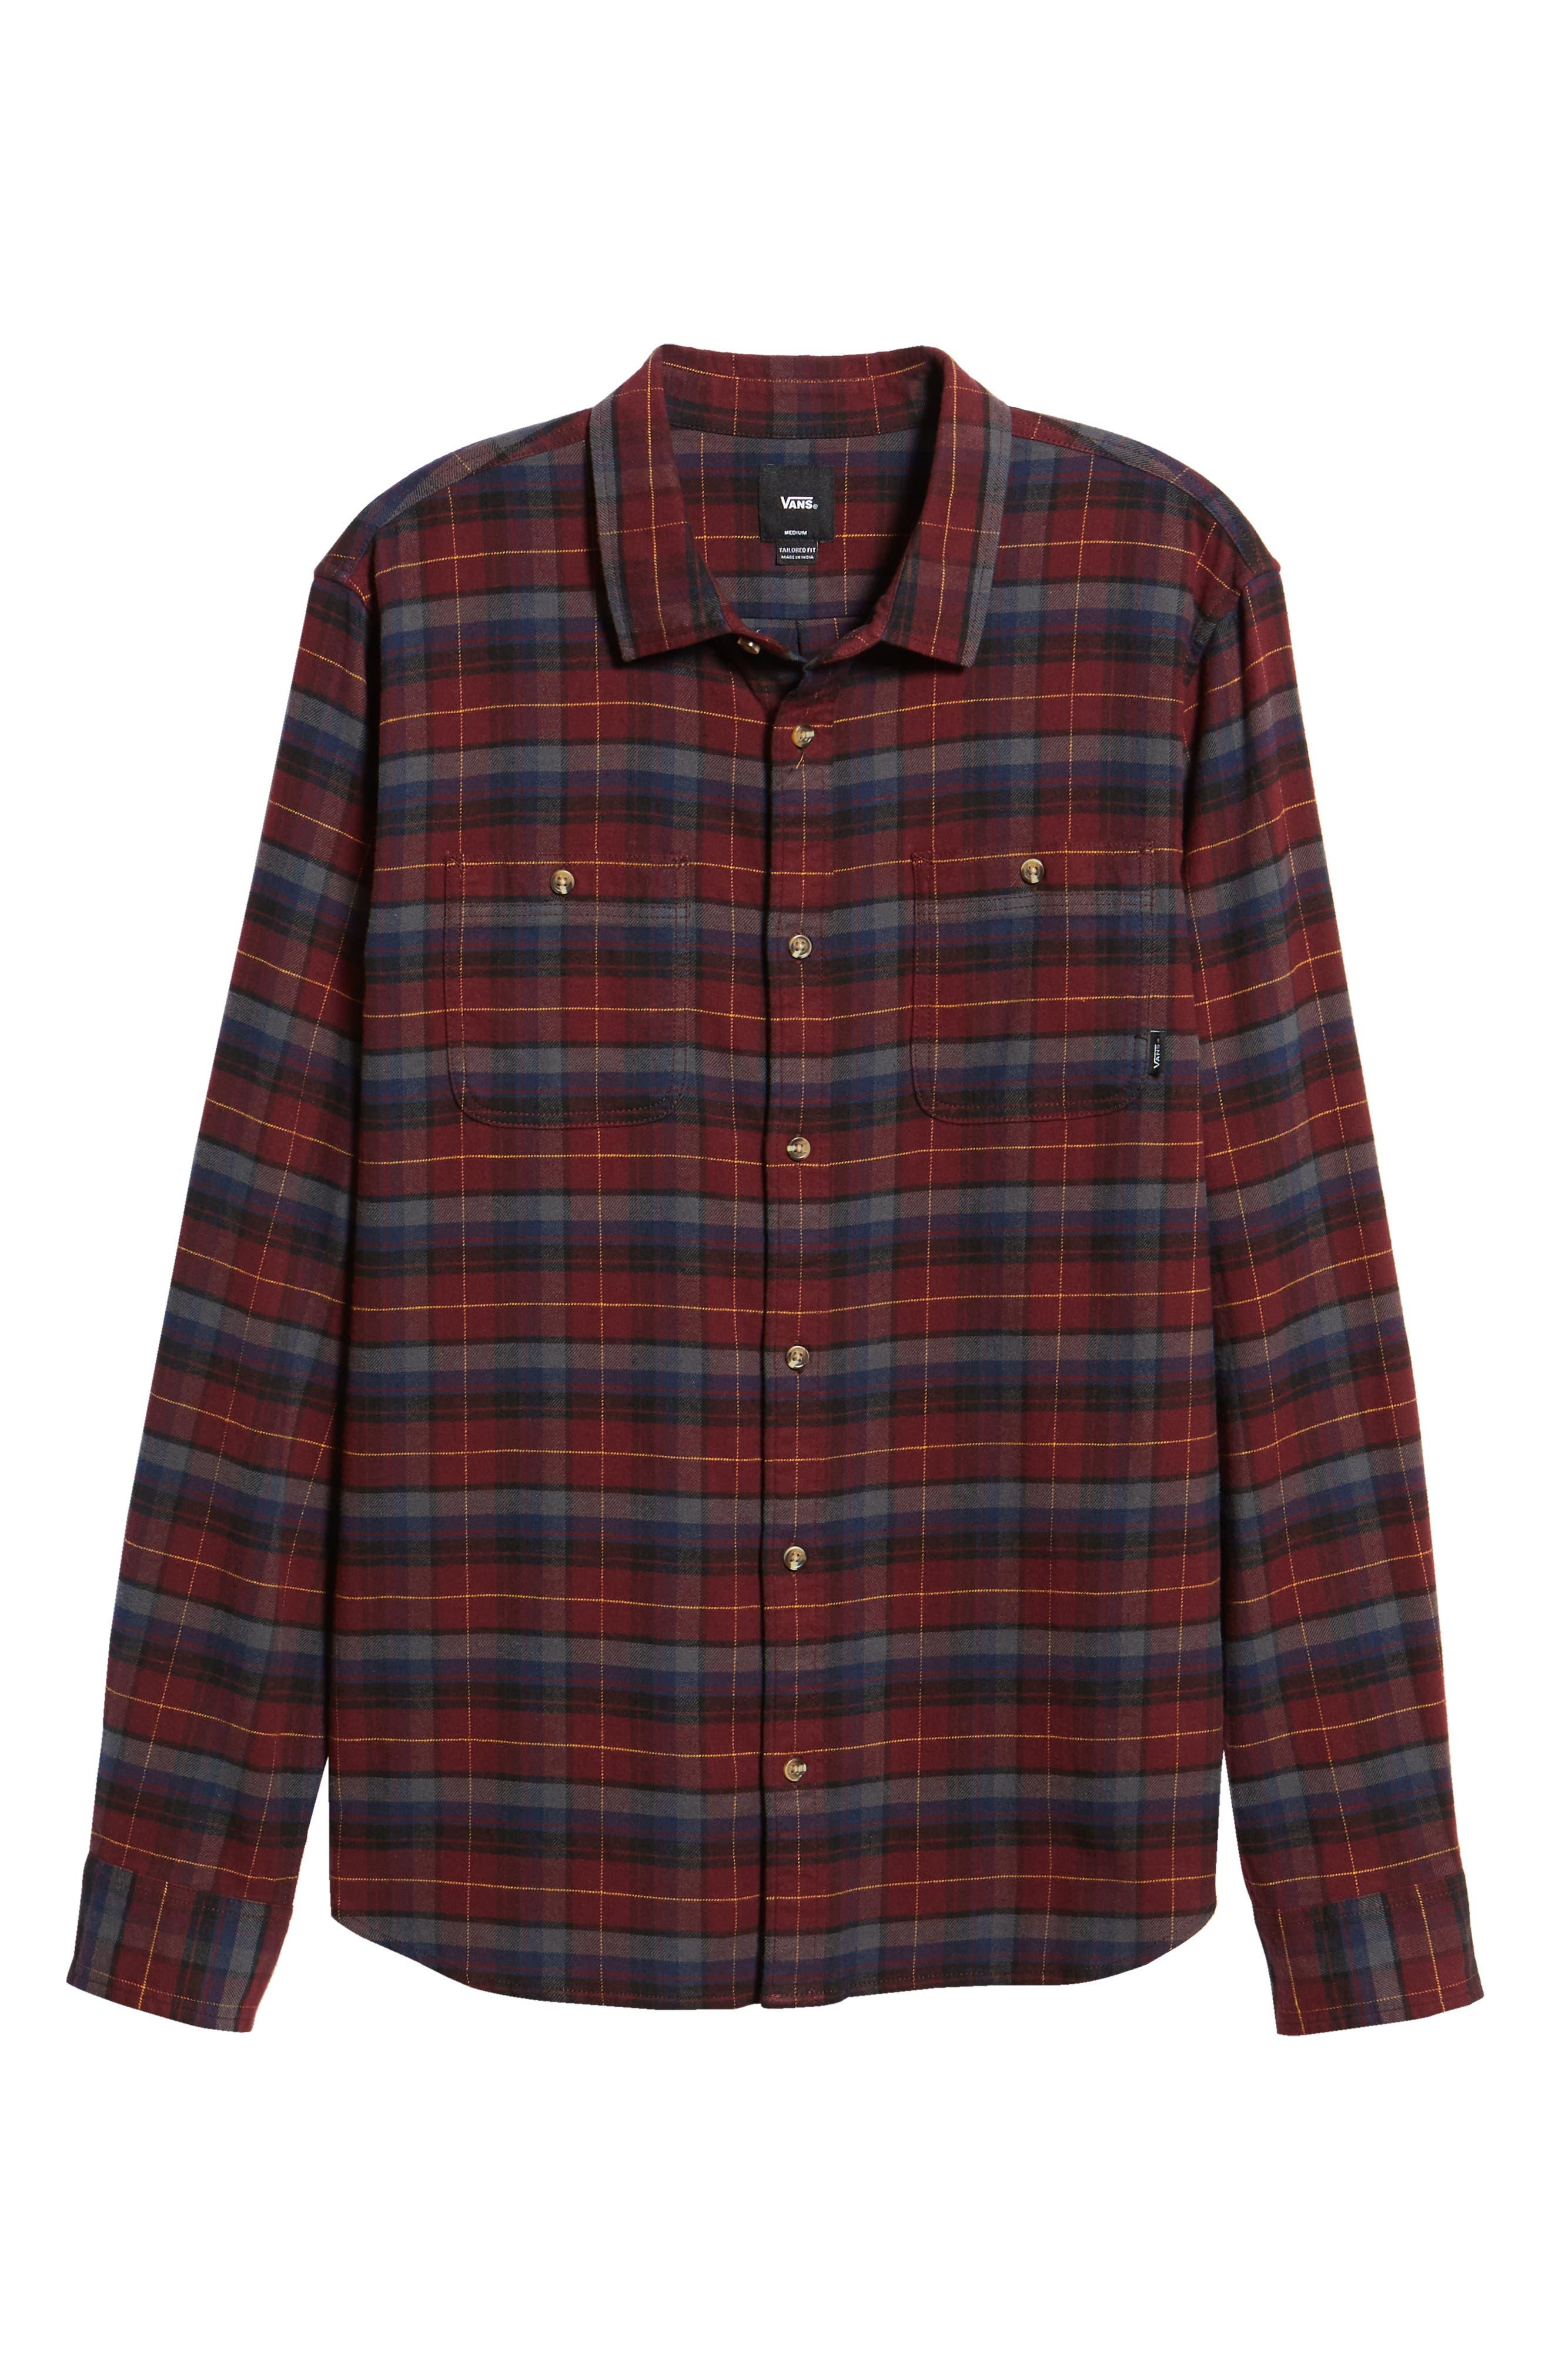 Banfield III Plaid Flannel Shirt,                             Alternate thumbnail 5, color,                             930